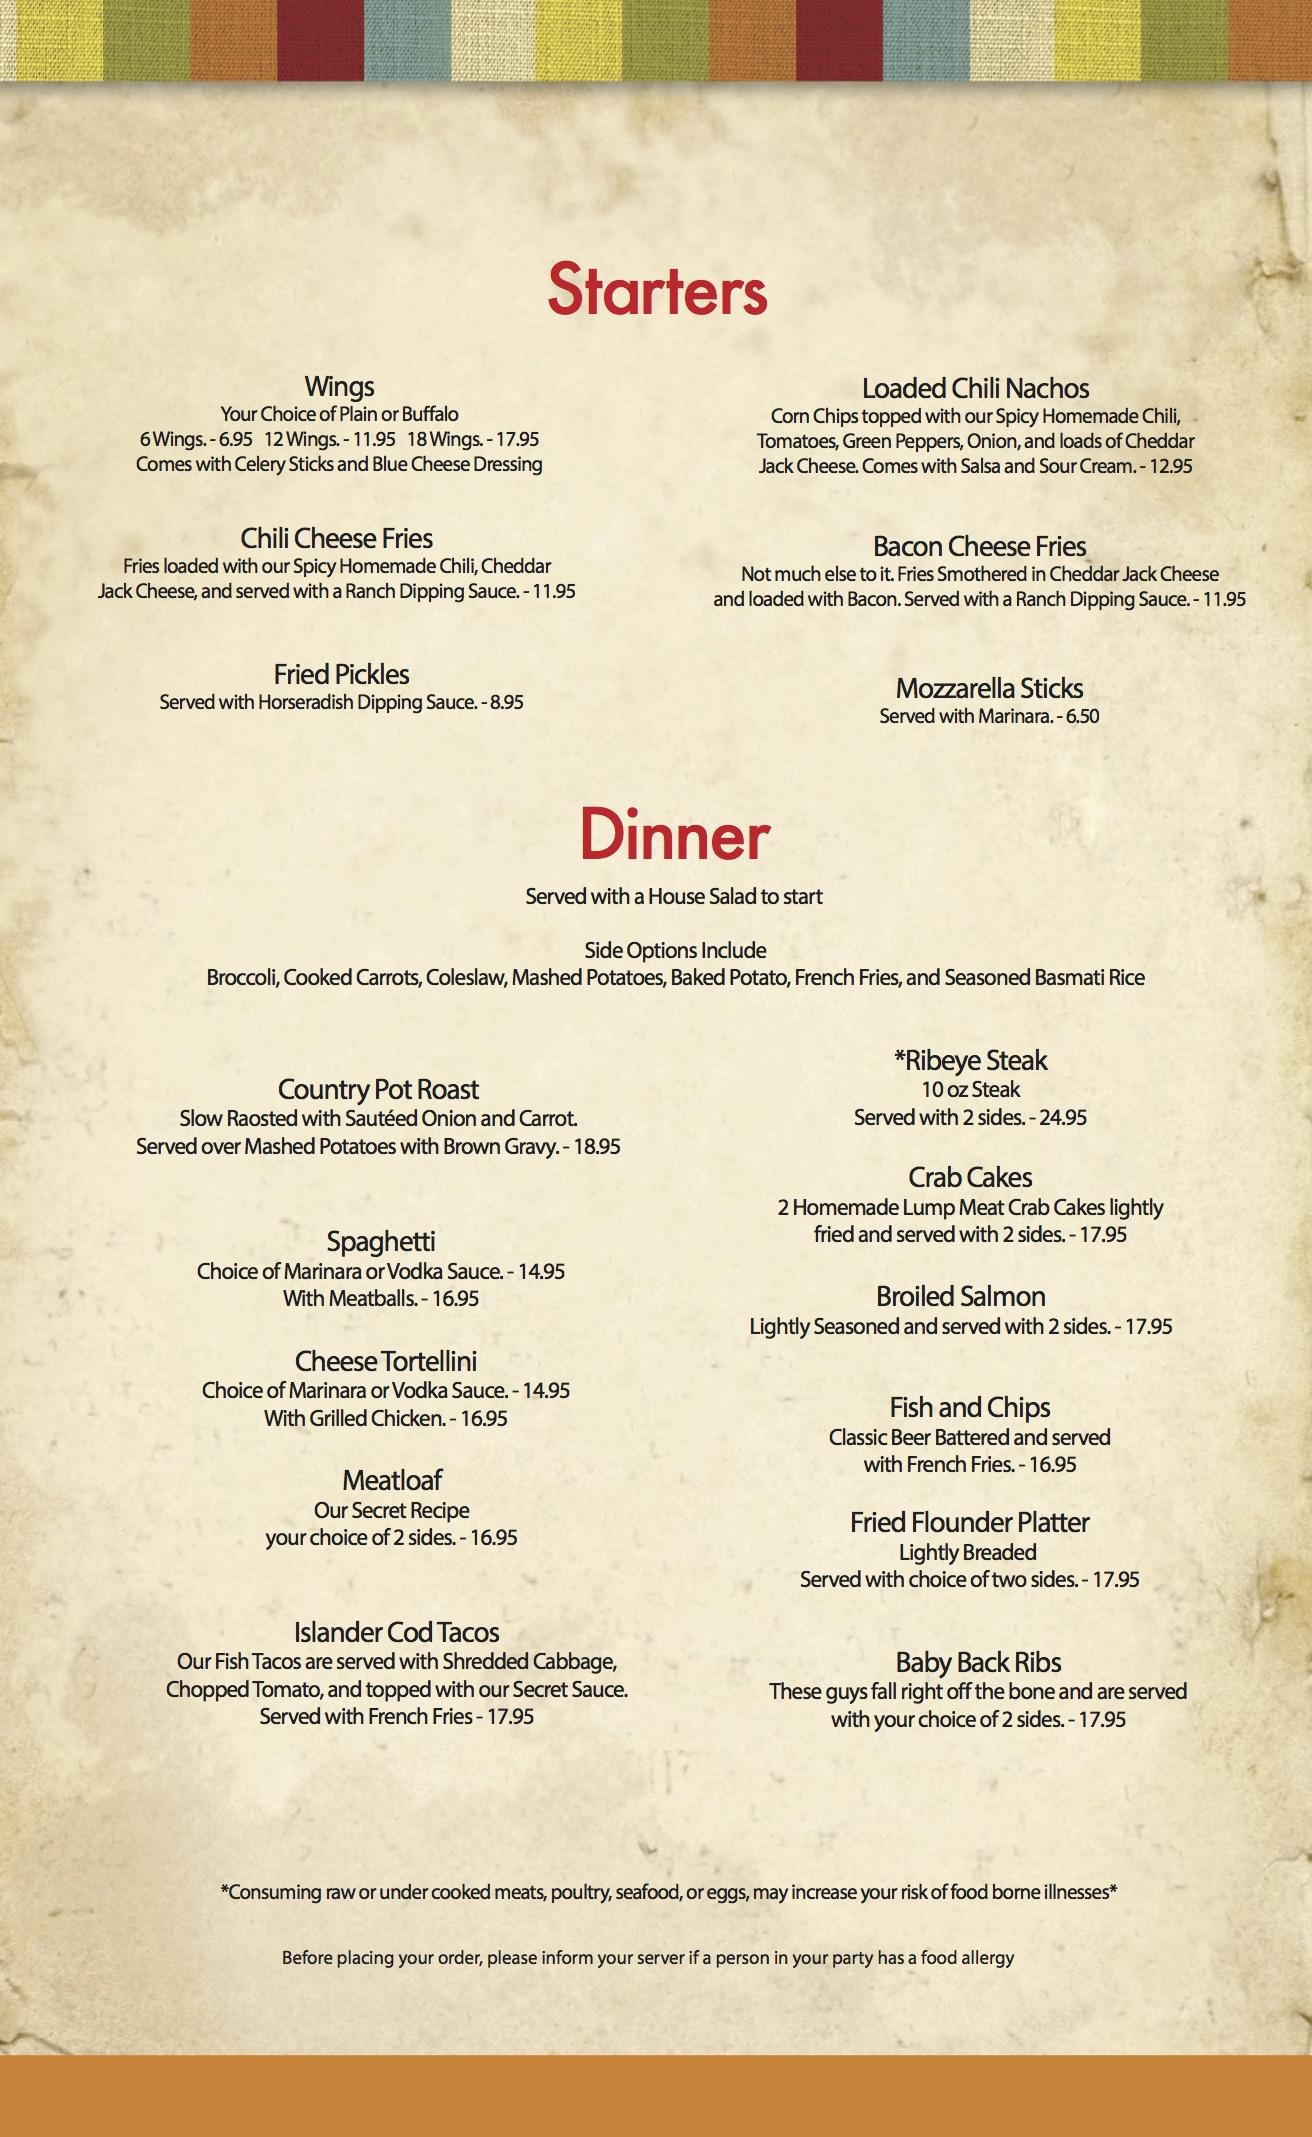 DinnerMenuPage1 7.18.18 copy.jpg